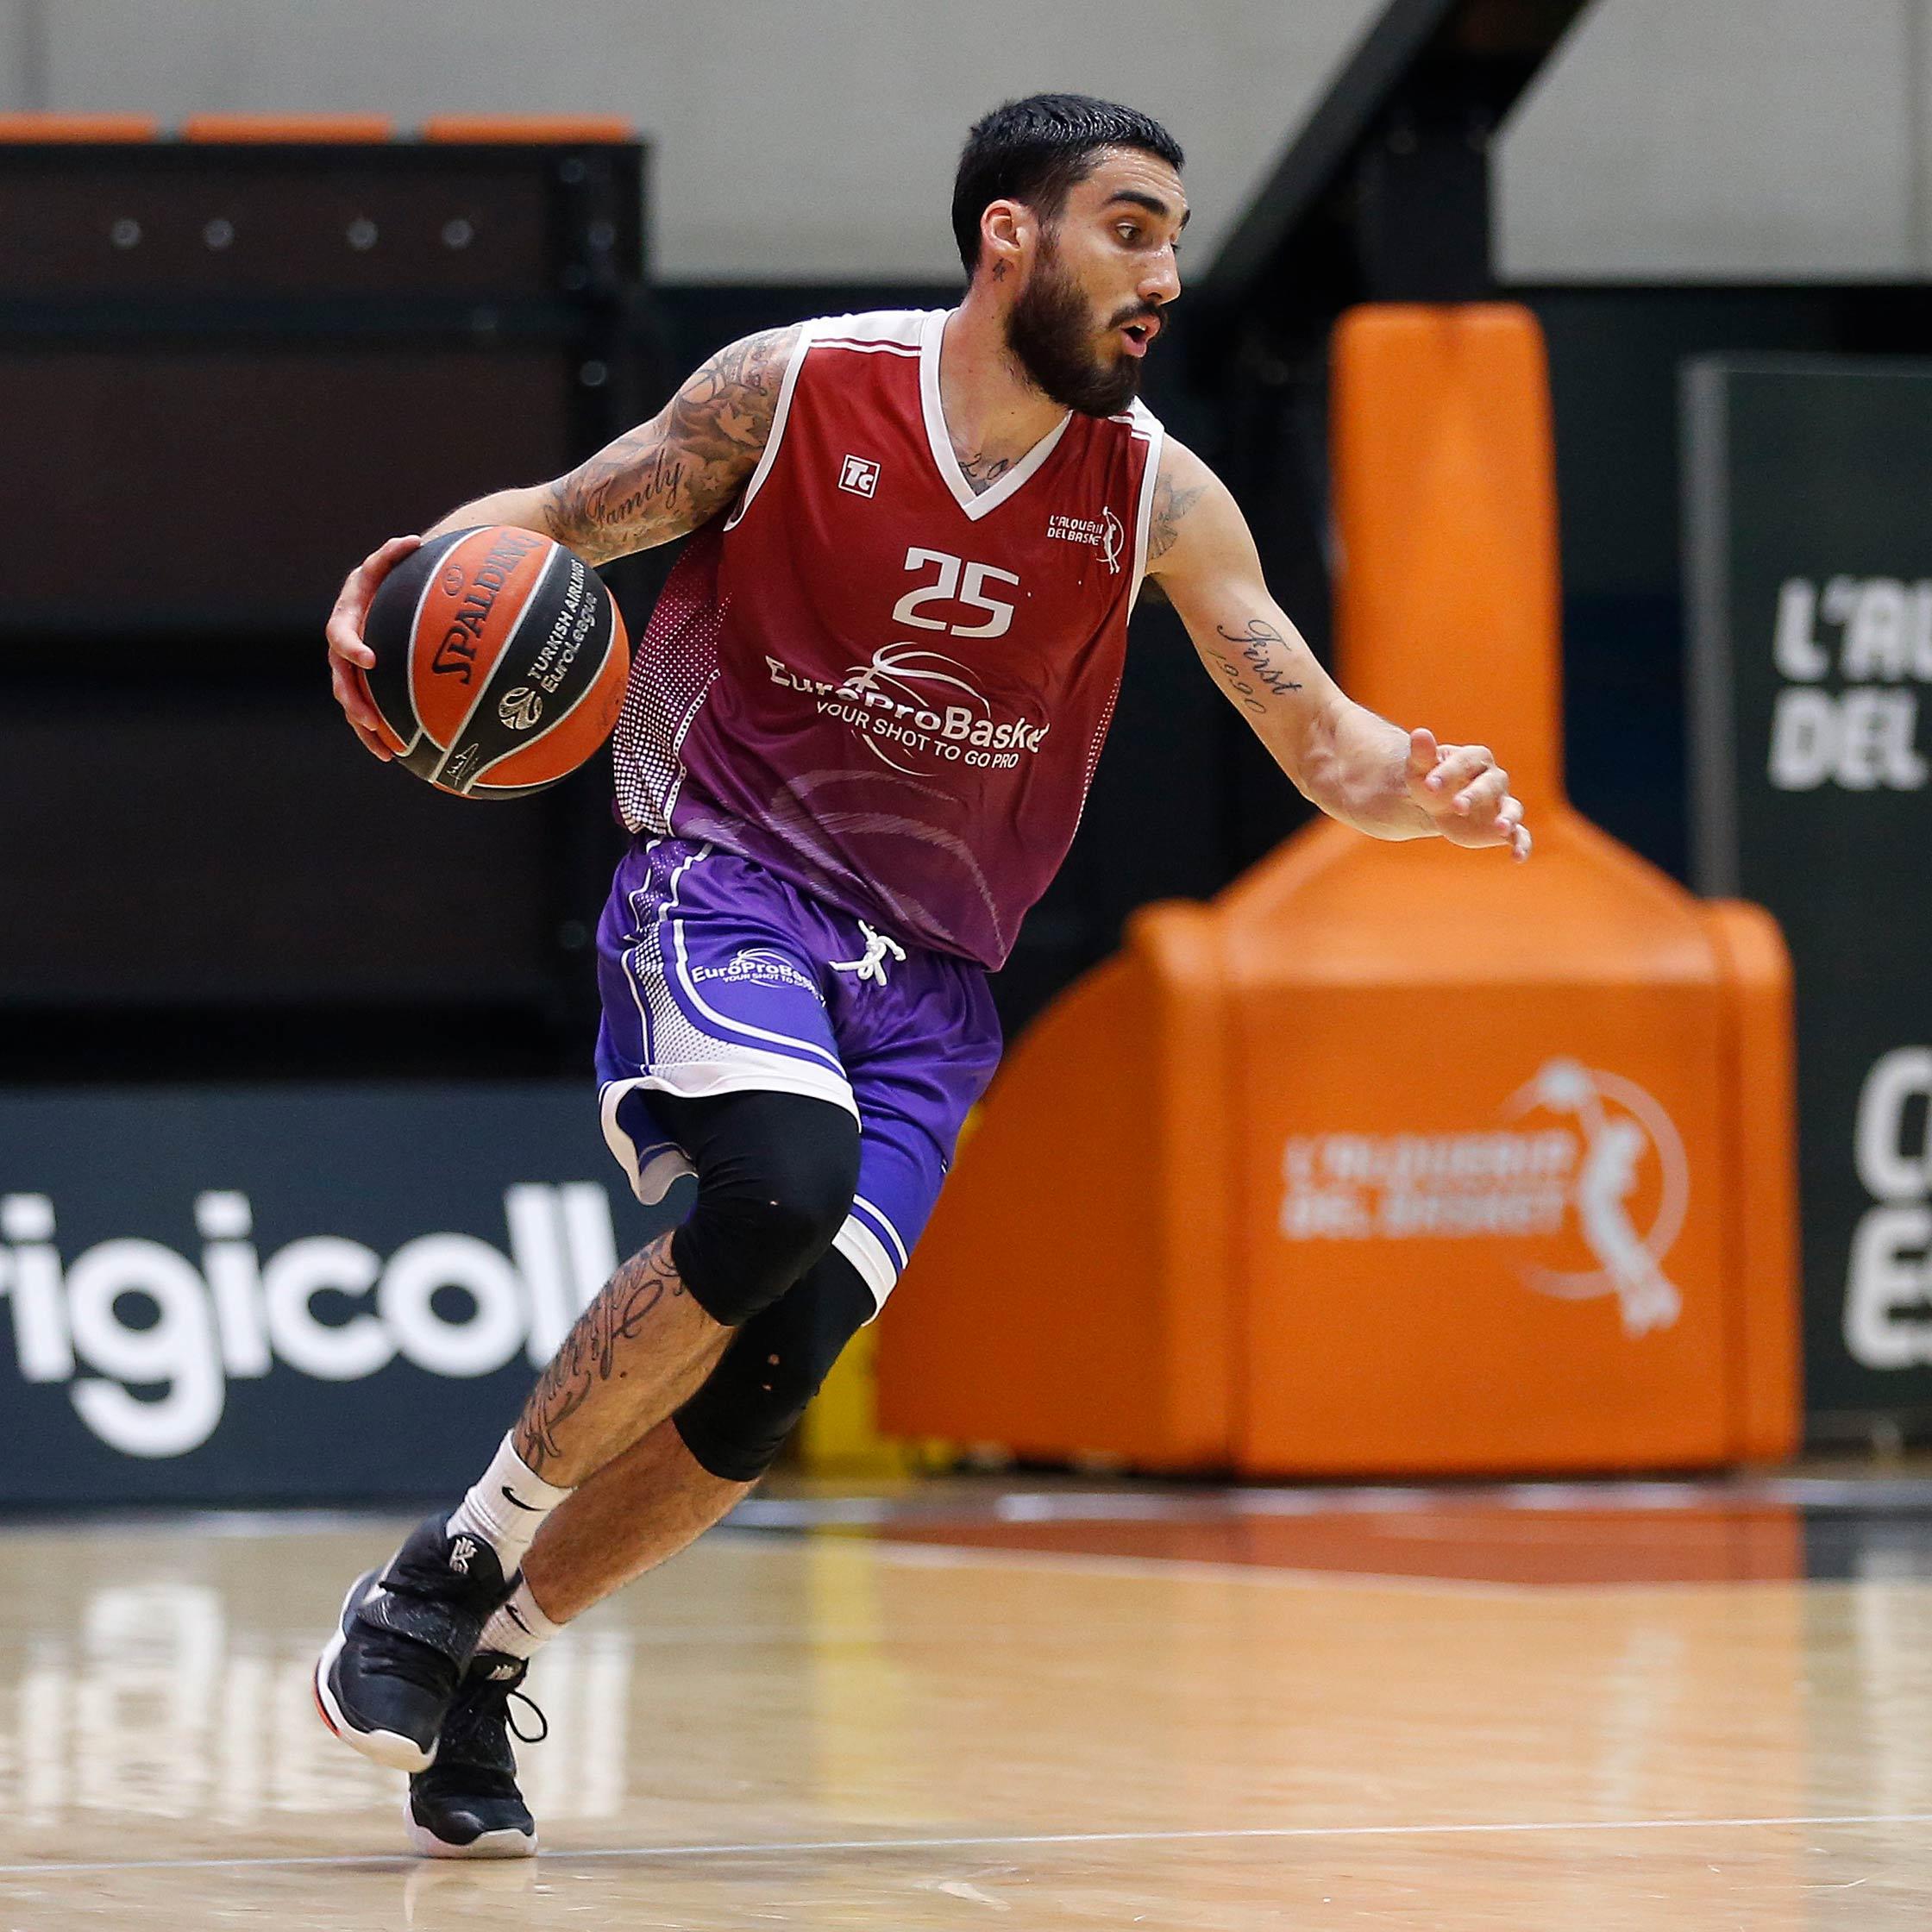 Jose Ramos EuroProBasket european Summer League